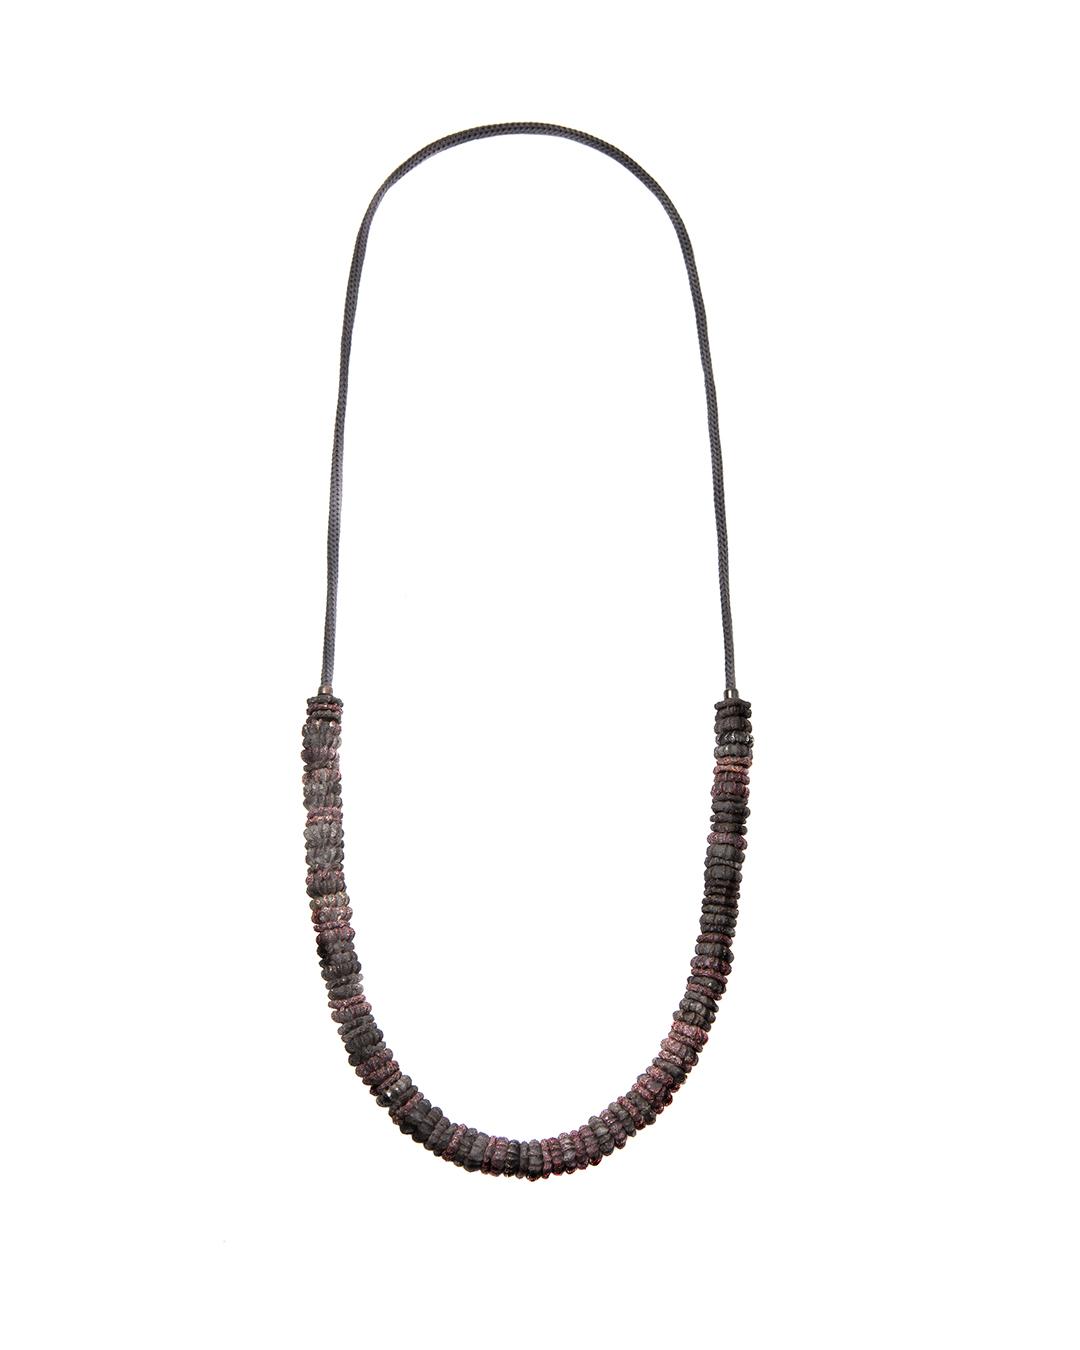 Barbara Schrobenhauser, Small Transformation, 2015, necklace; shibuichi, string, 720 mm, €1335